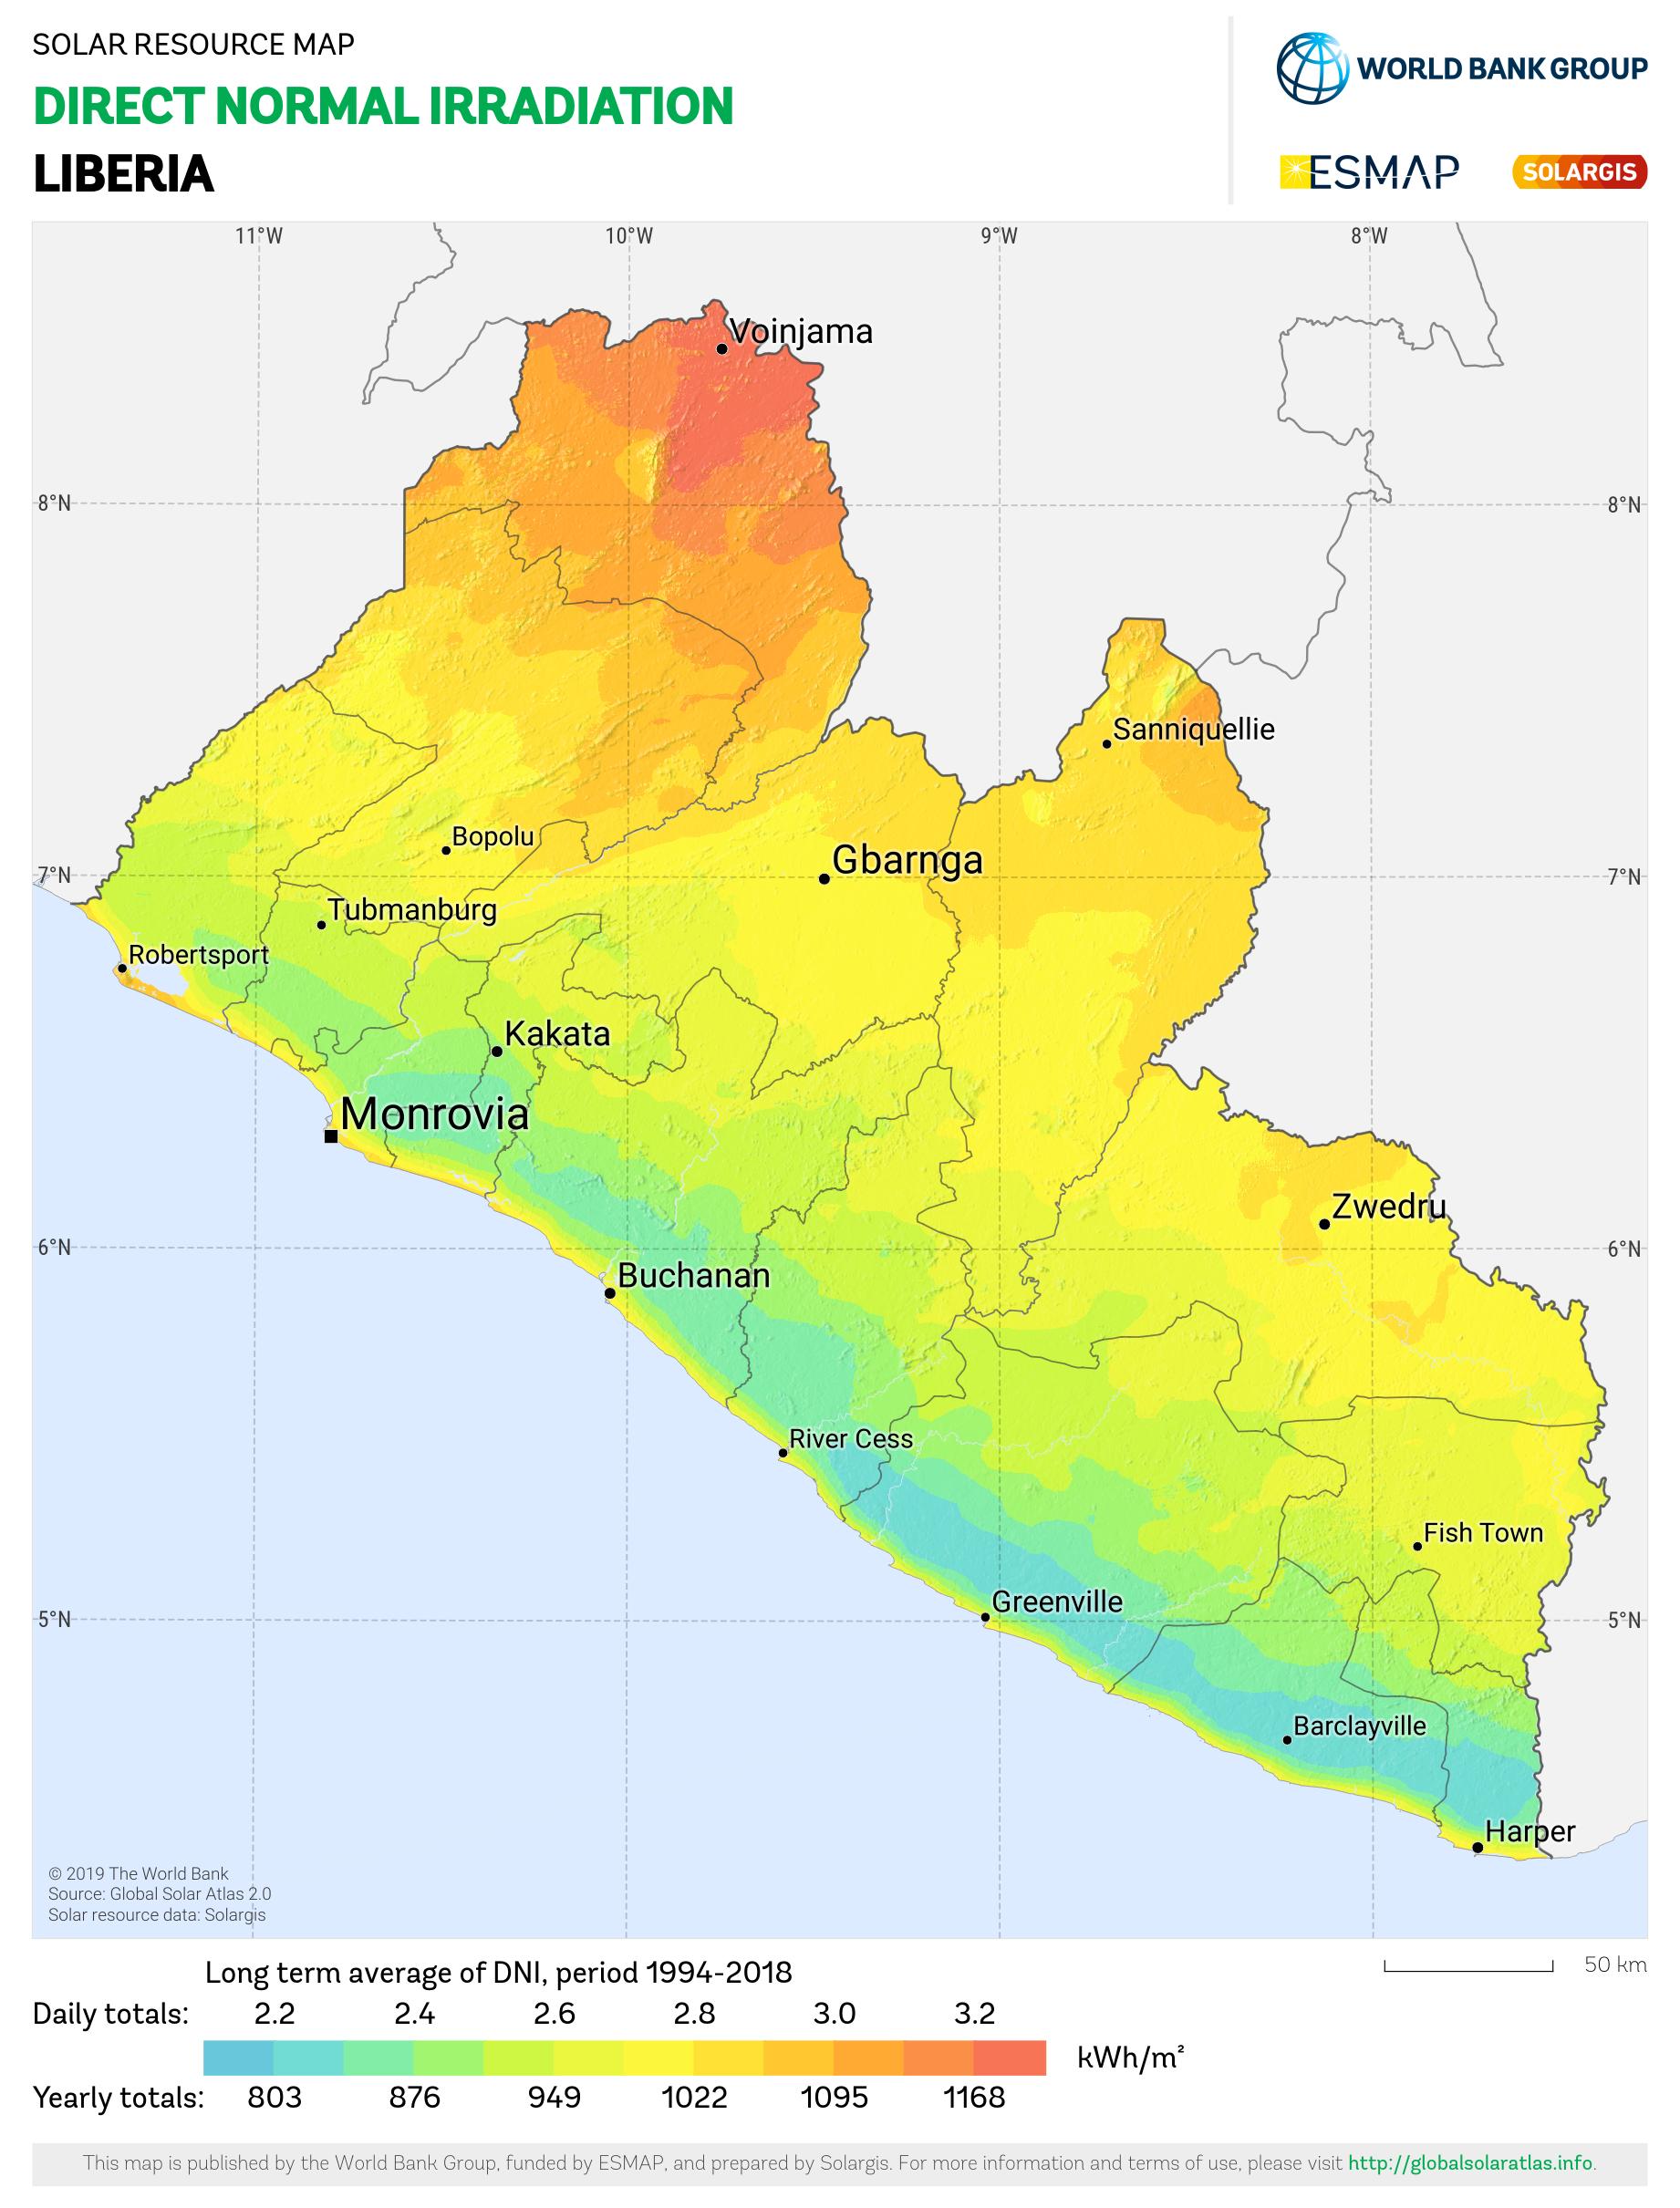 SOLARGIS_DNI Liberia_PVOUT KWH per m2